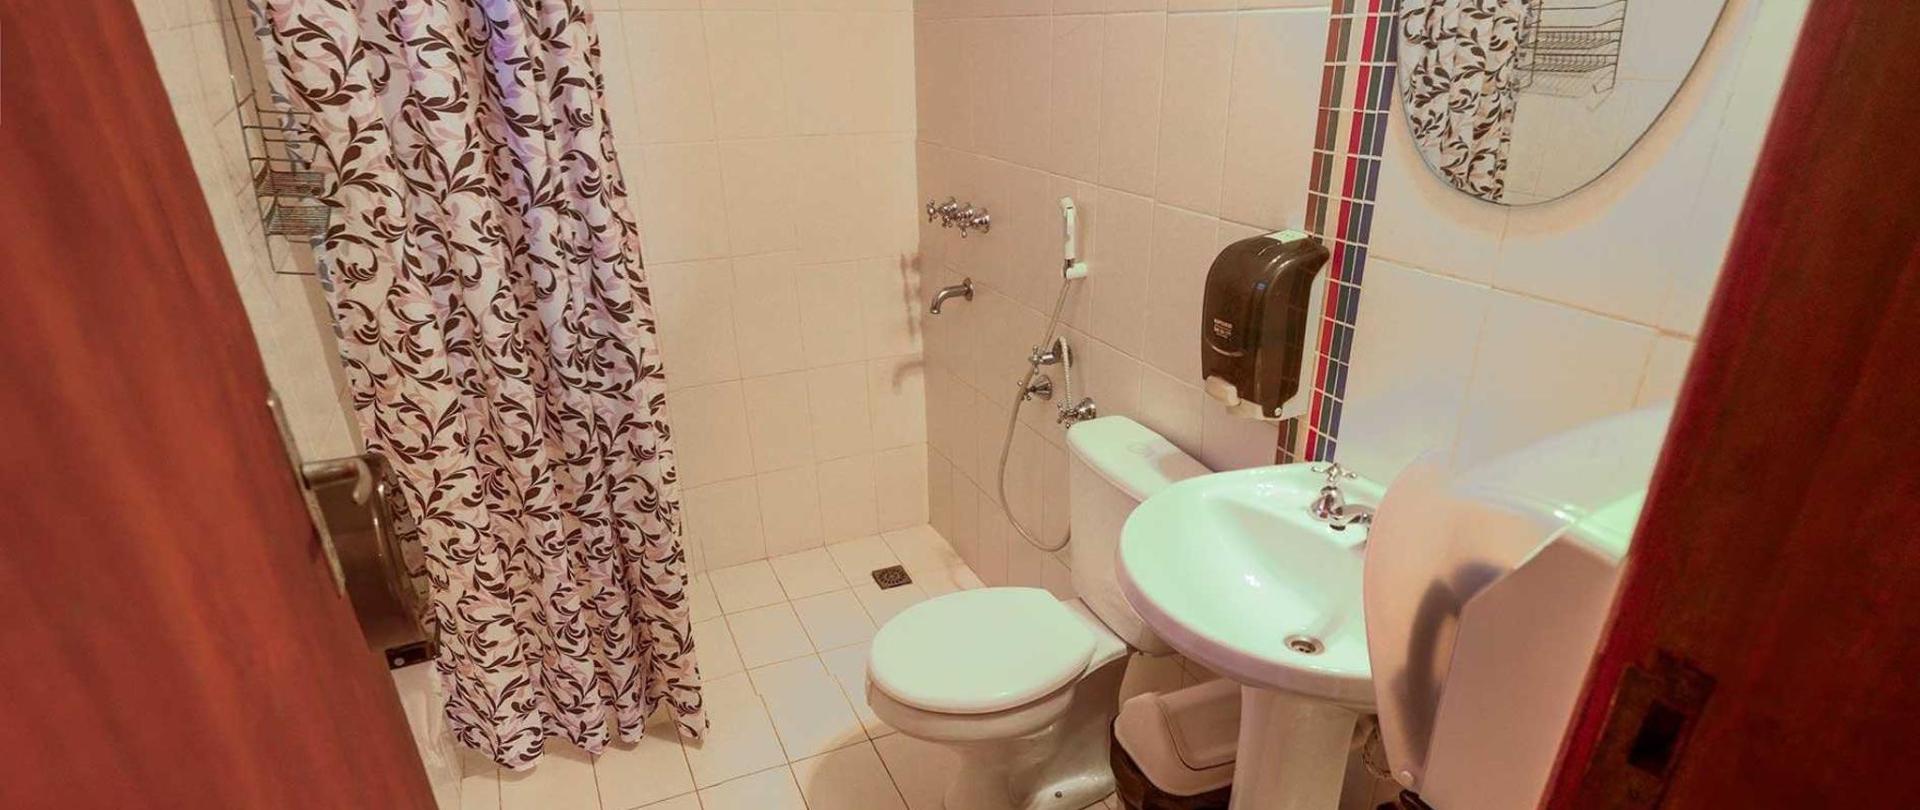 ara35-banho-afuera-pieza.jpg